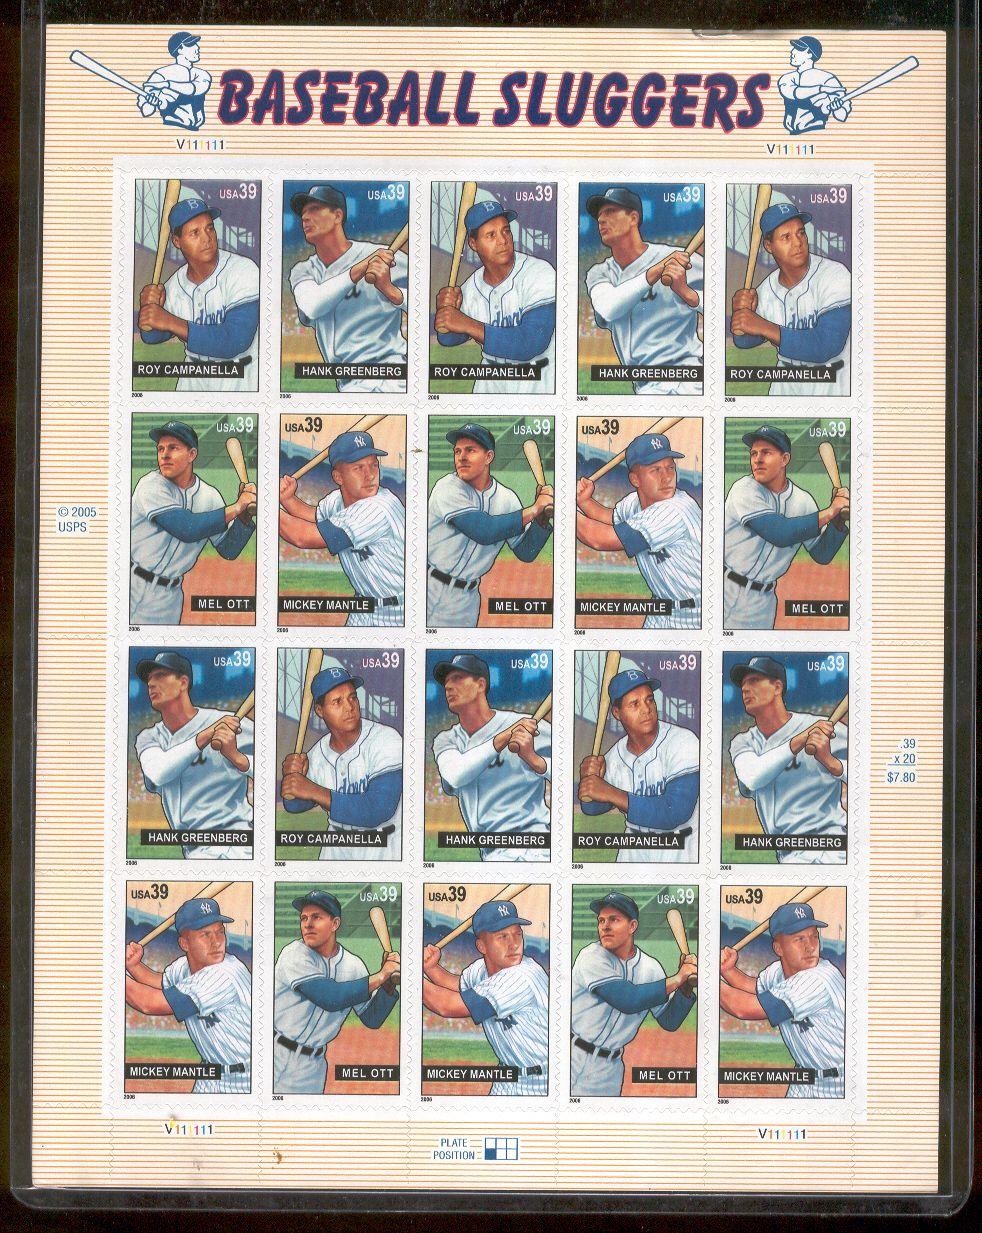 2005 USPS 39 Cent Baseball Sluggers Stamp Panel Of 20 Stamps